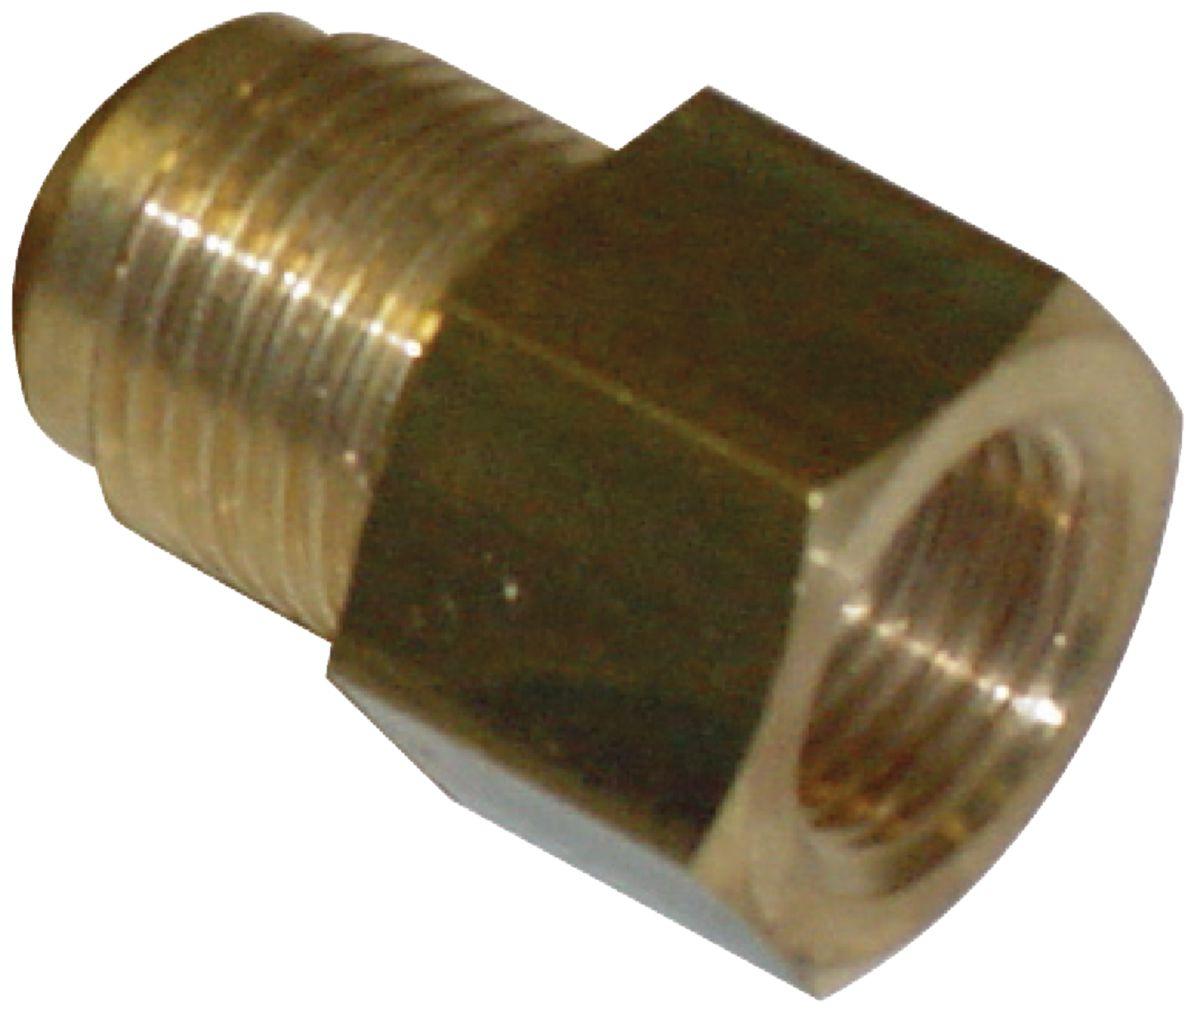 Réduction diamètre femelle 1/2 male 5/8 seul Réf ACU178A5